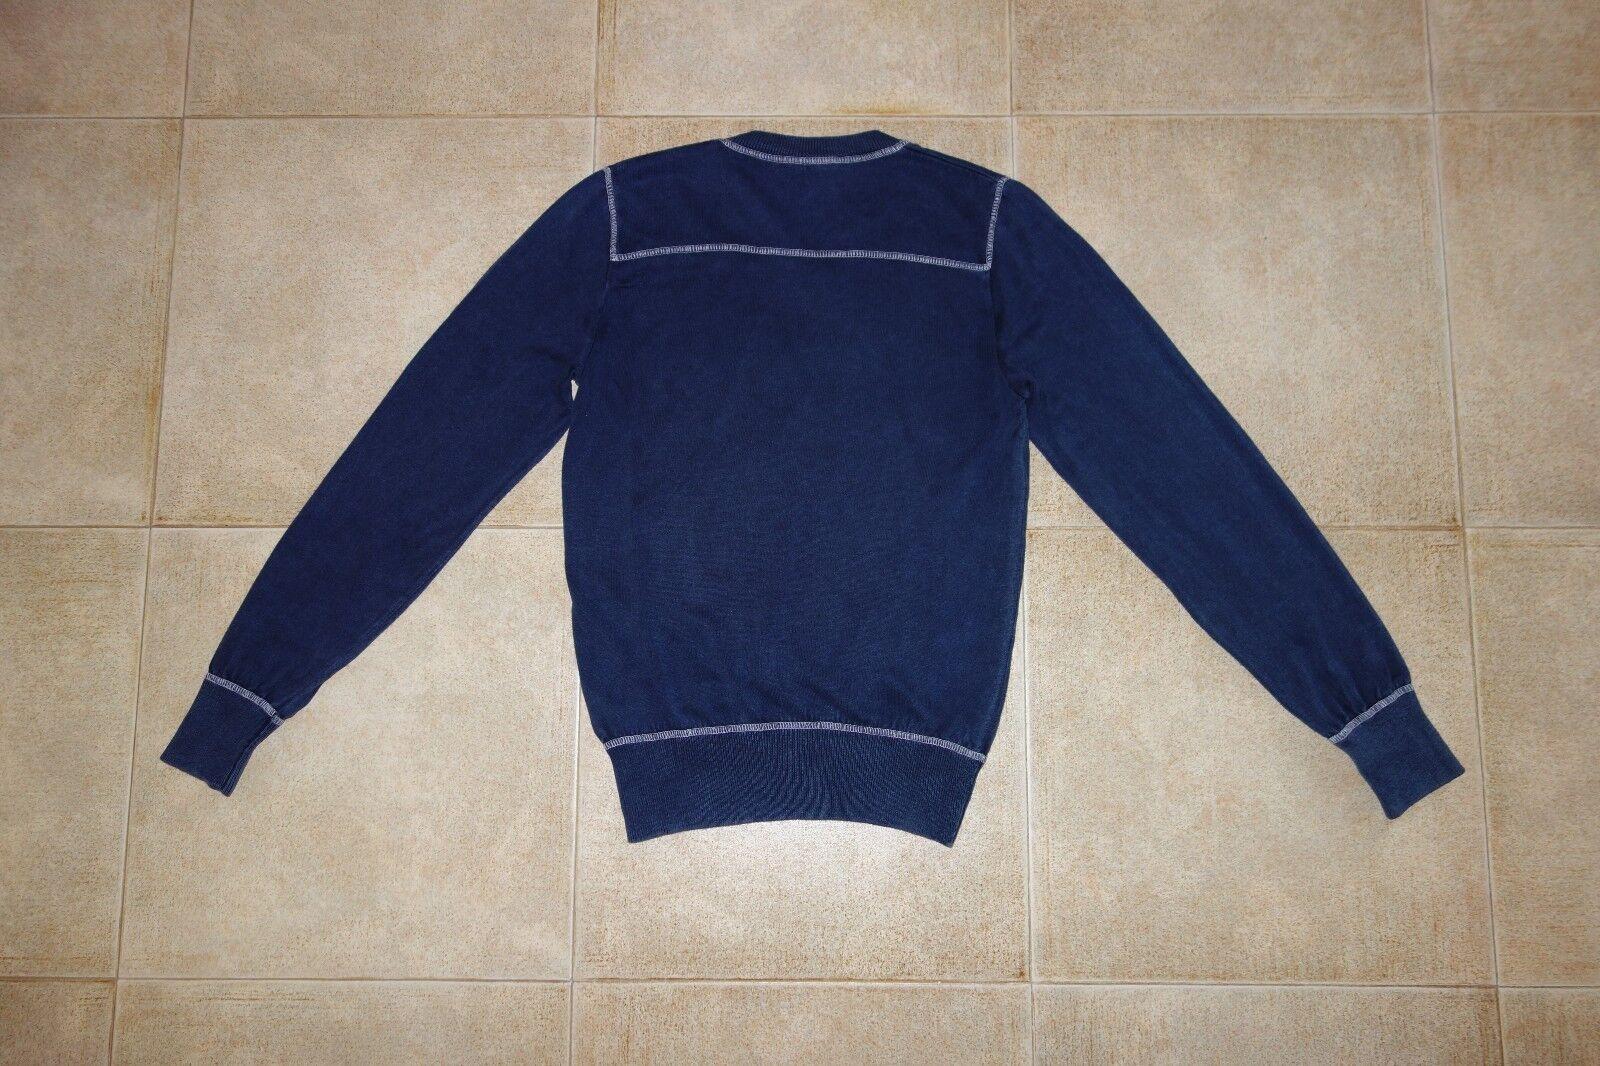 Dsquarosso² Run. CHIP CHIP CHIP CHIP Felpa Maglione Sweater M SS/04 71YM053 MadeInItaly 96ed4b